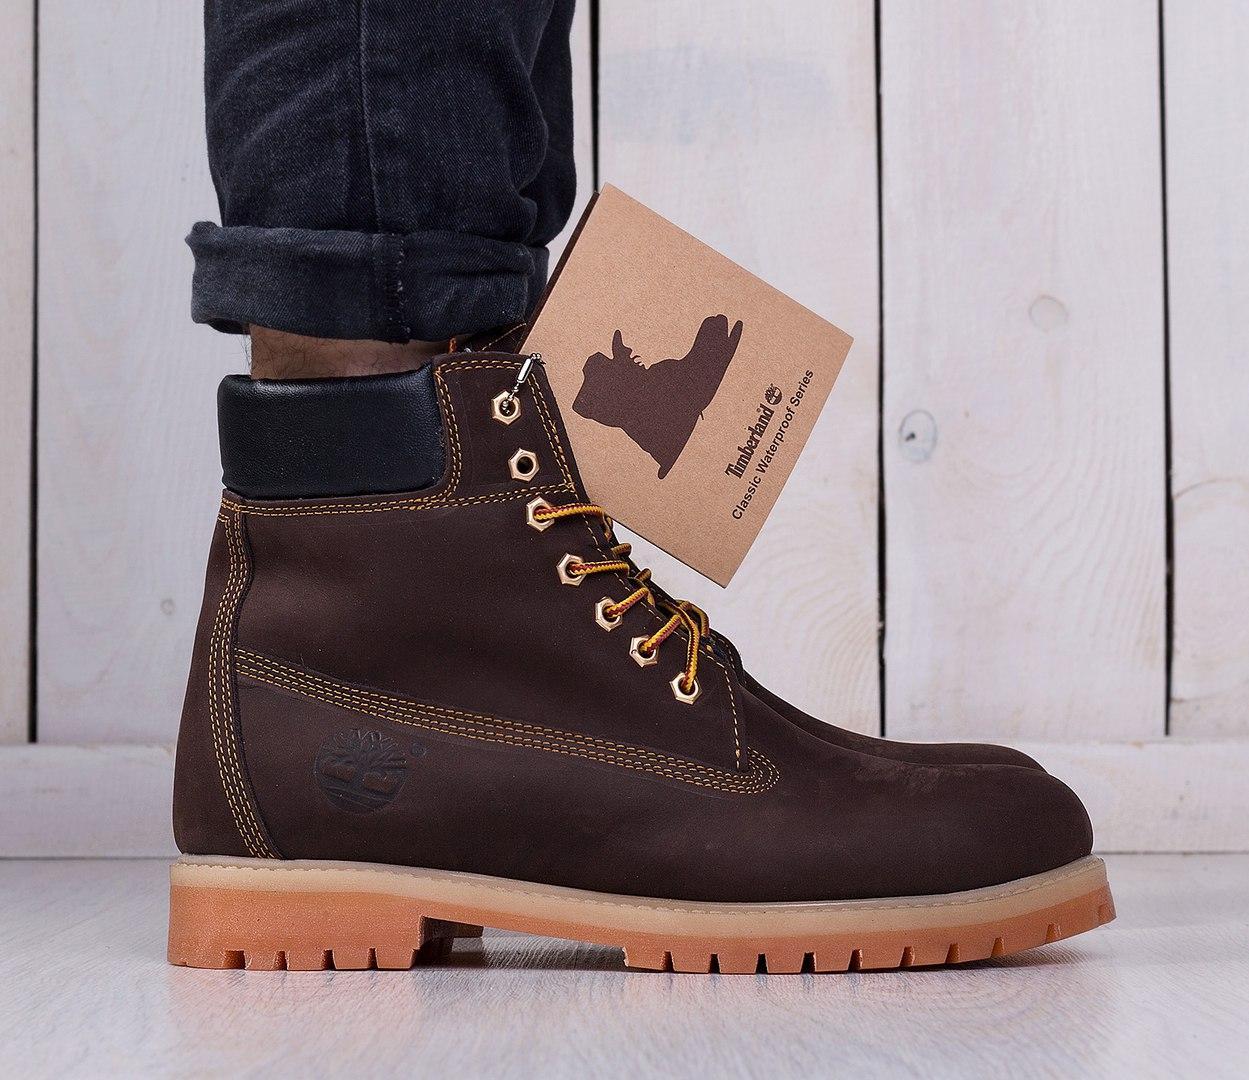 Ботинки Timberland мужские на овчине темно-коричневые топ реплика